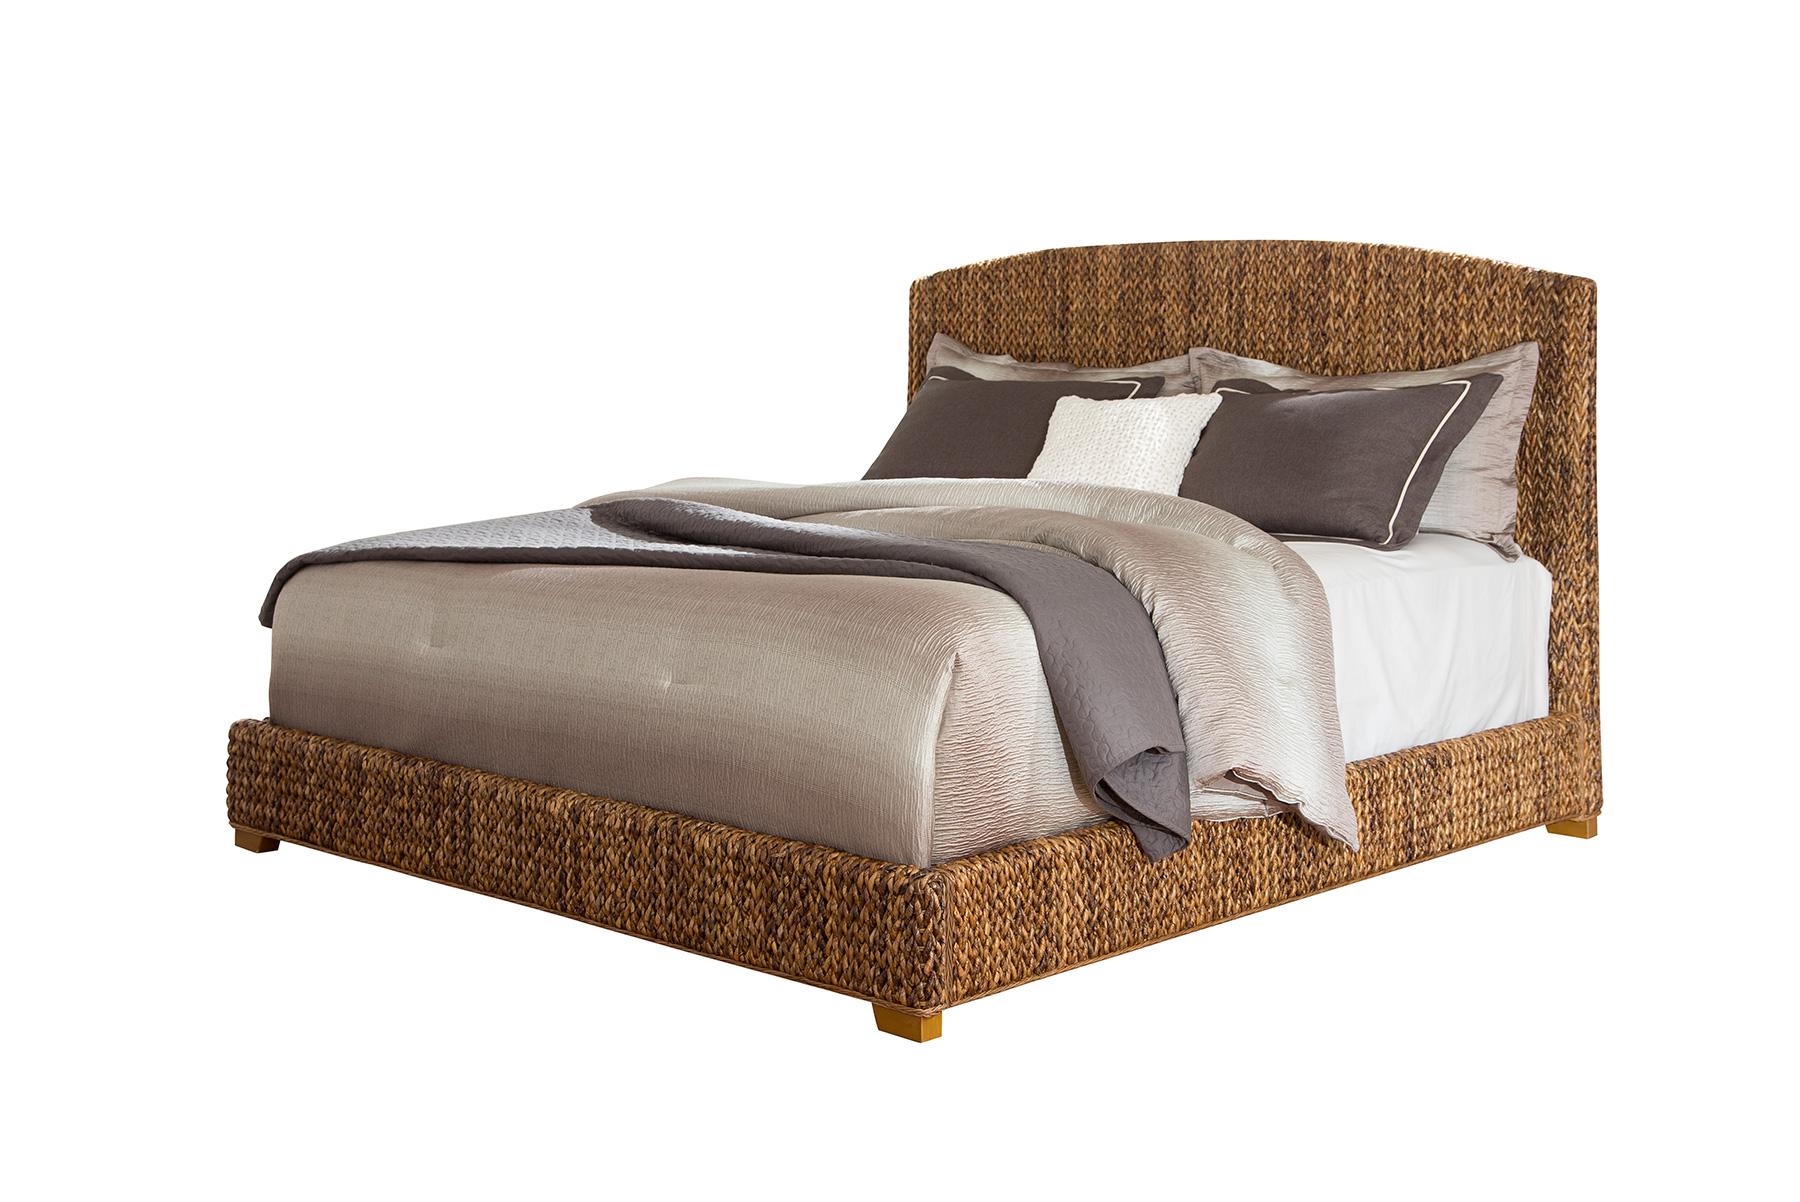 Coaster Laughton Woven Banana Leaf King Bed Miskelly Furniture Platform Beds Low Profile Beds